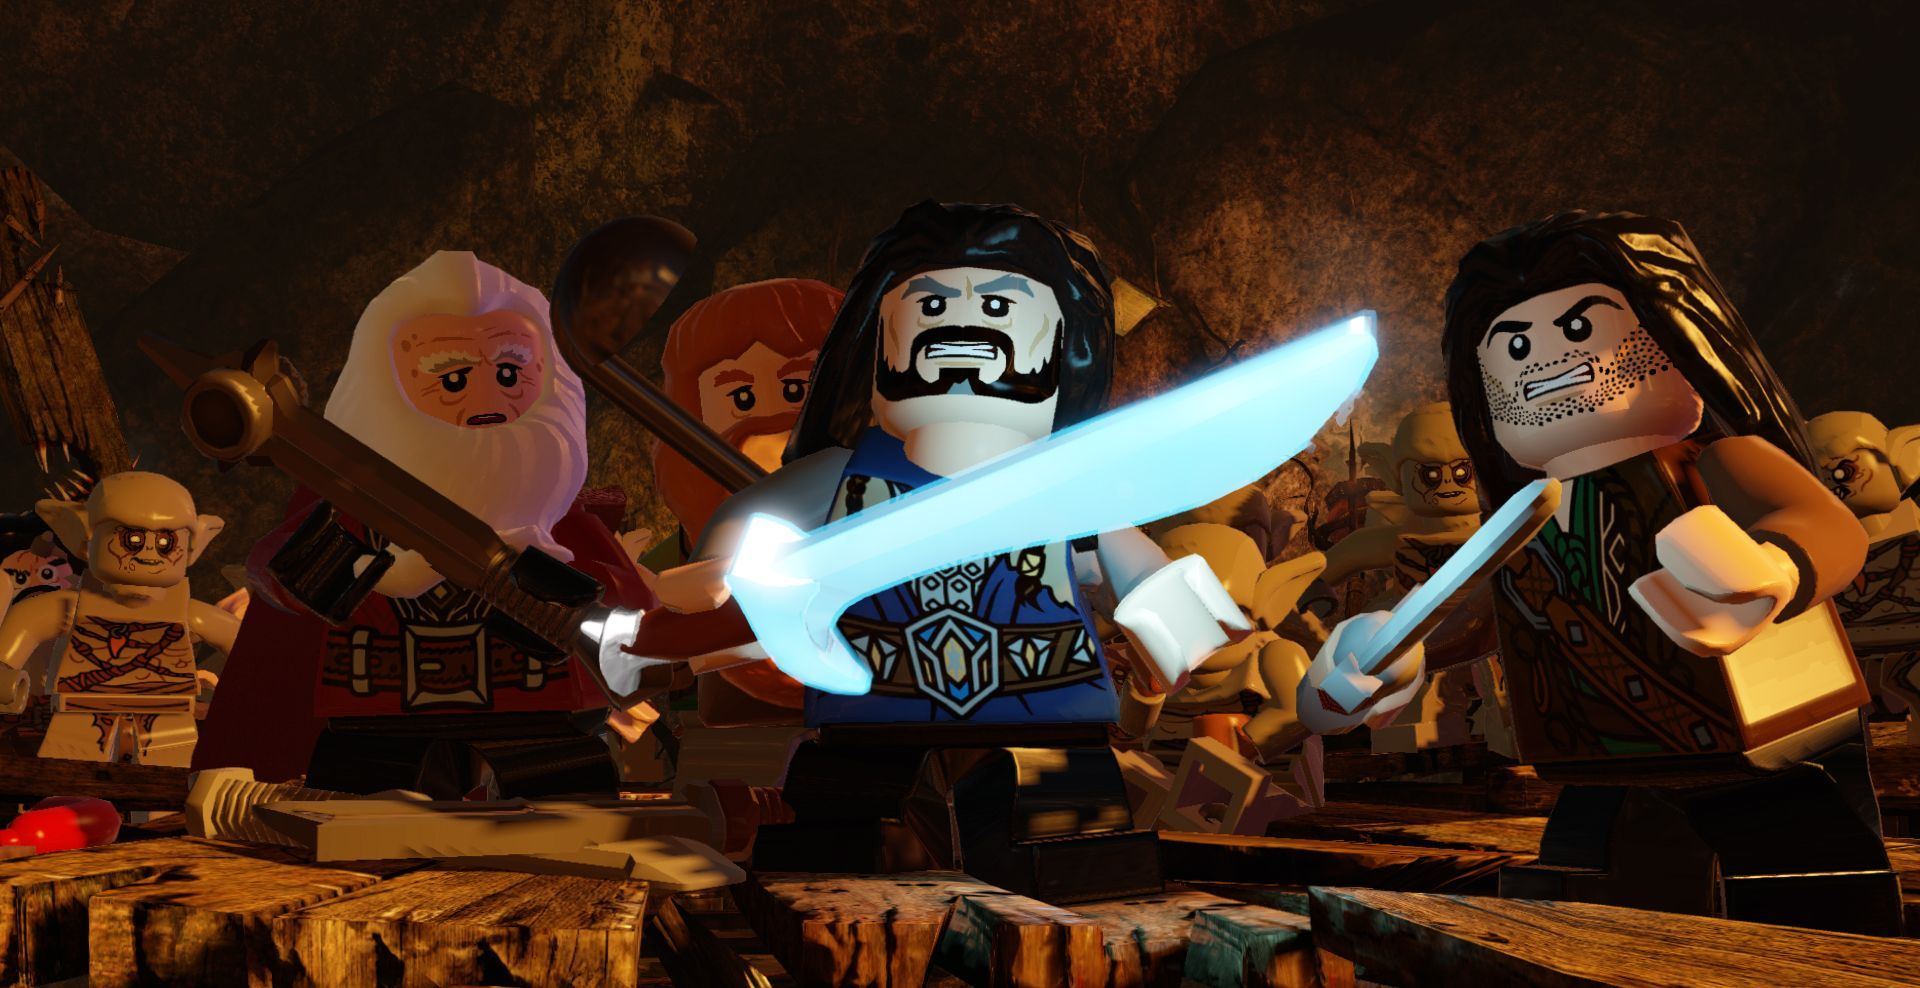 LEGO The Hobbit (Vita) - 4